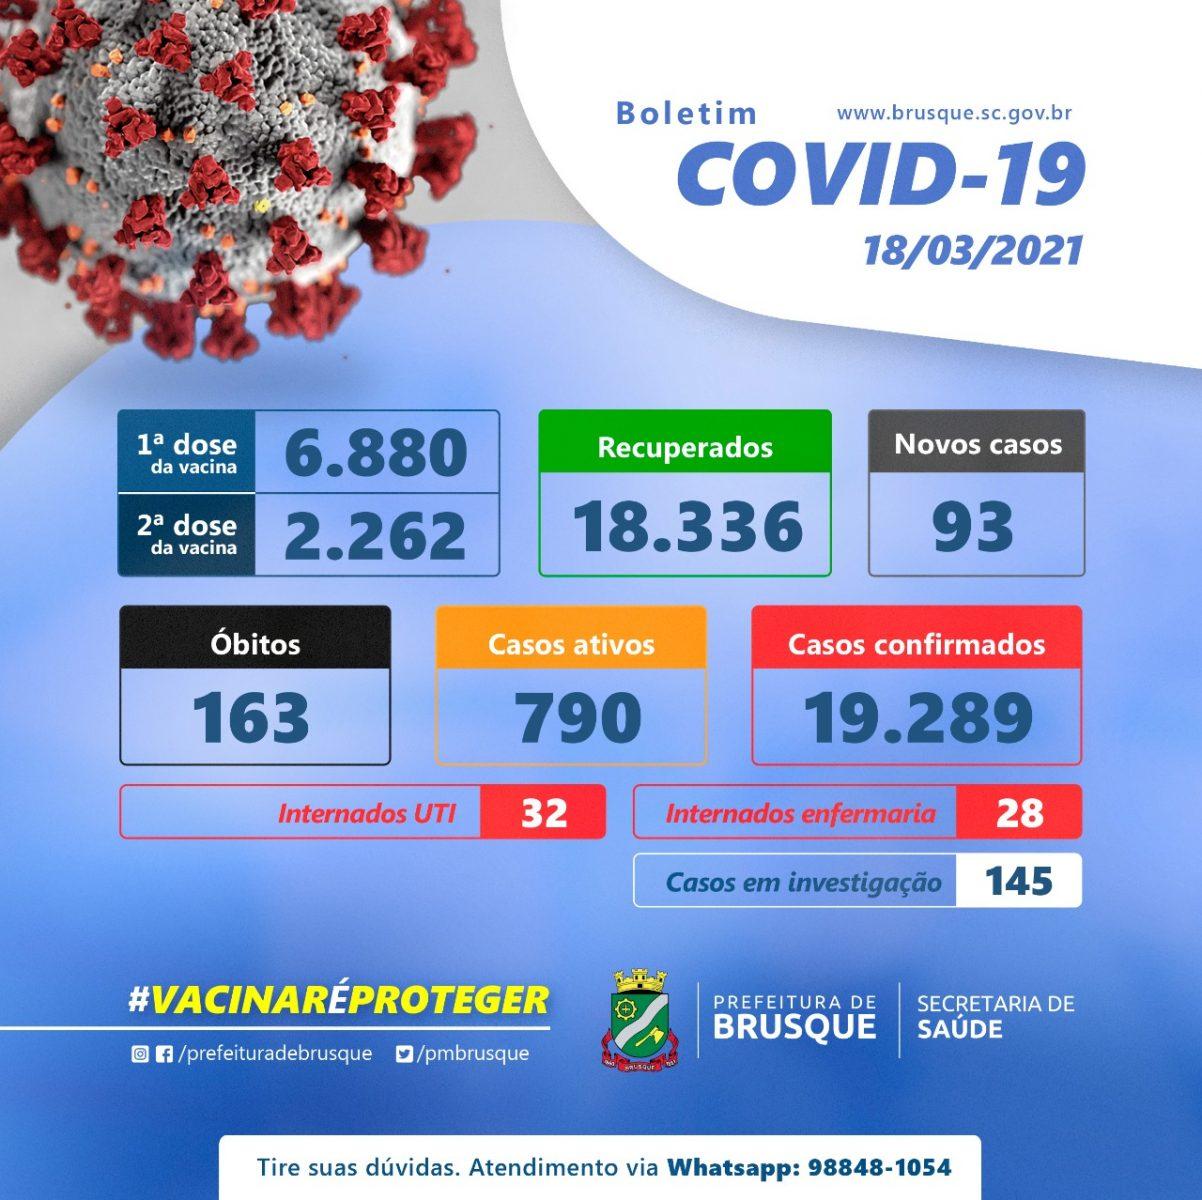 Covid-19: Confira o boletim epidemiológico desta quinta-feira (18)